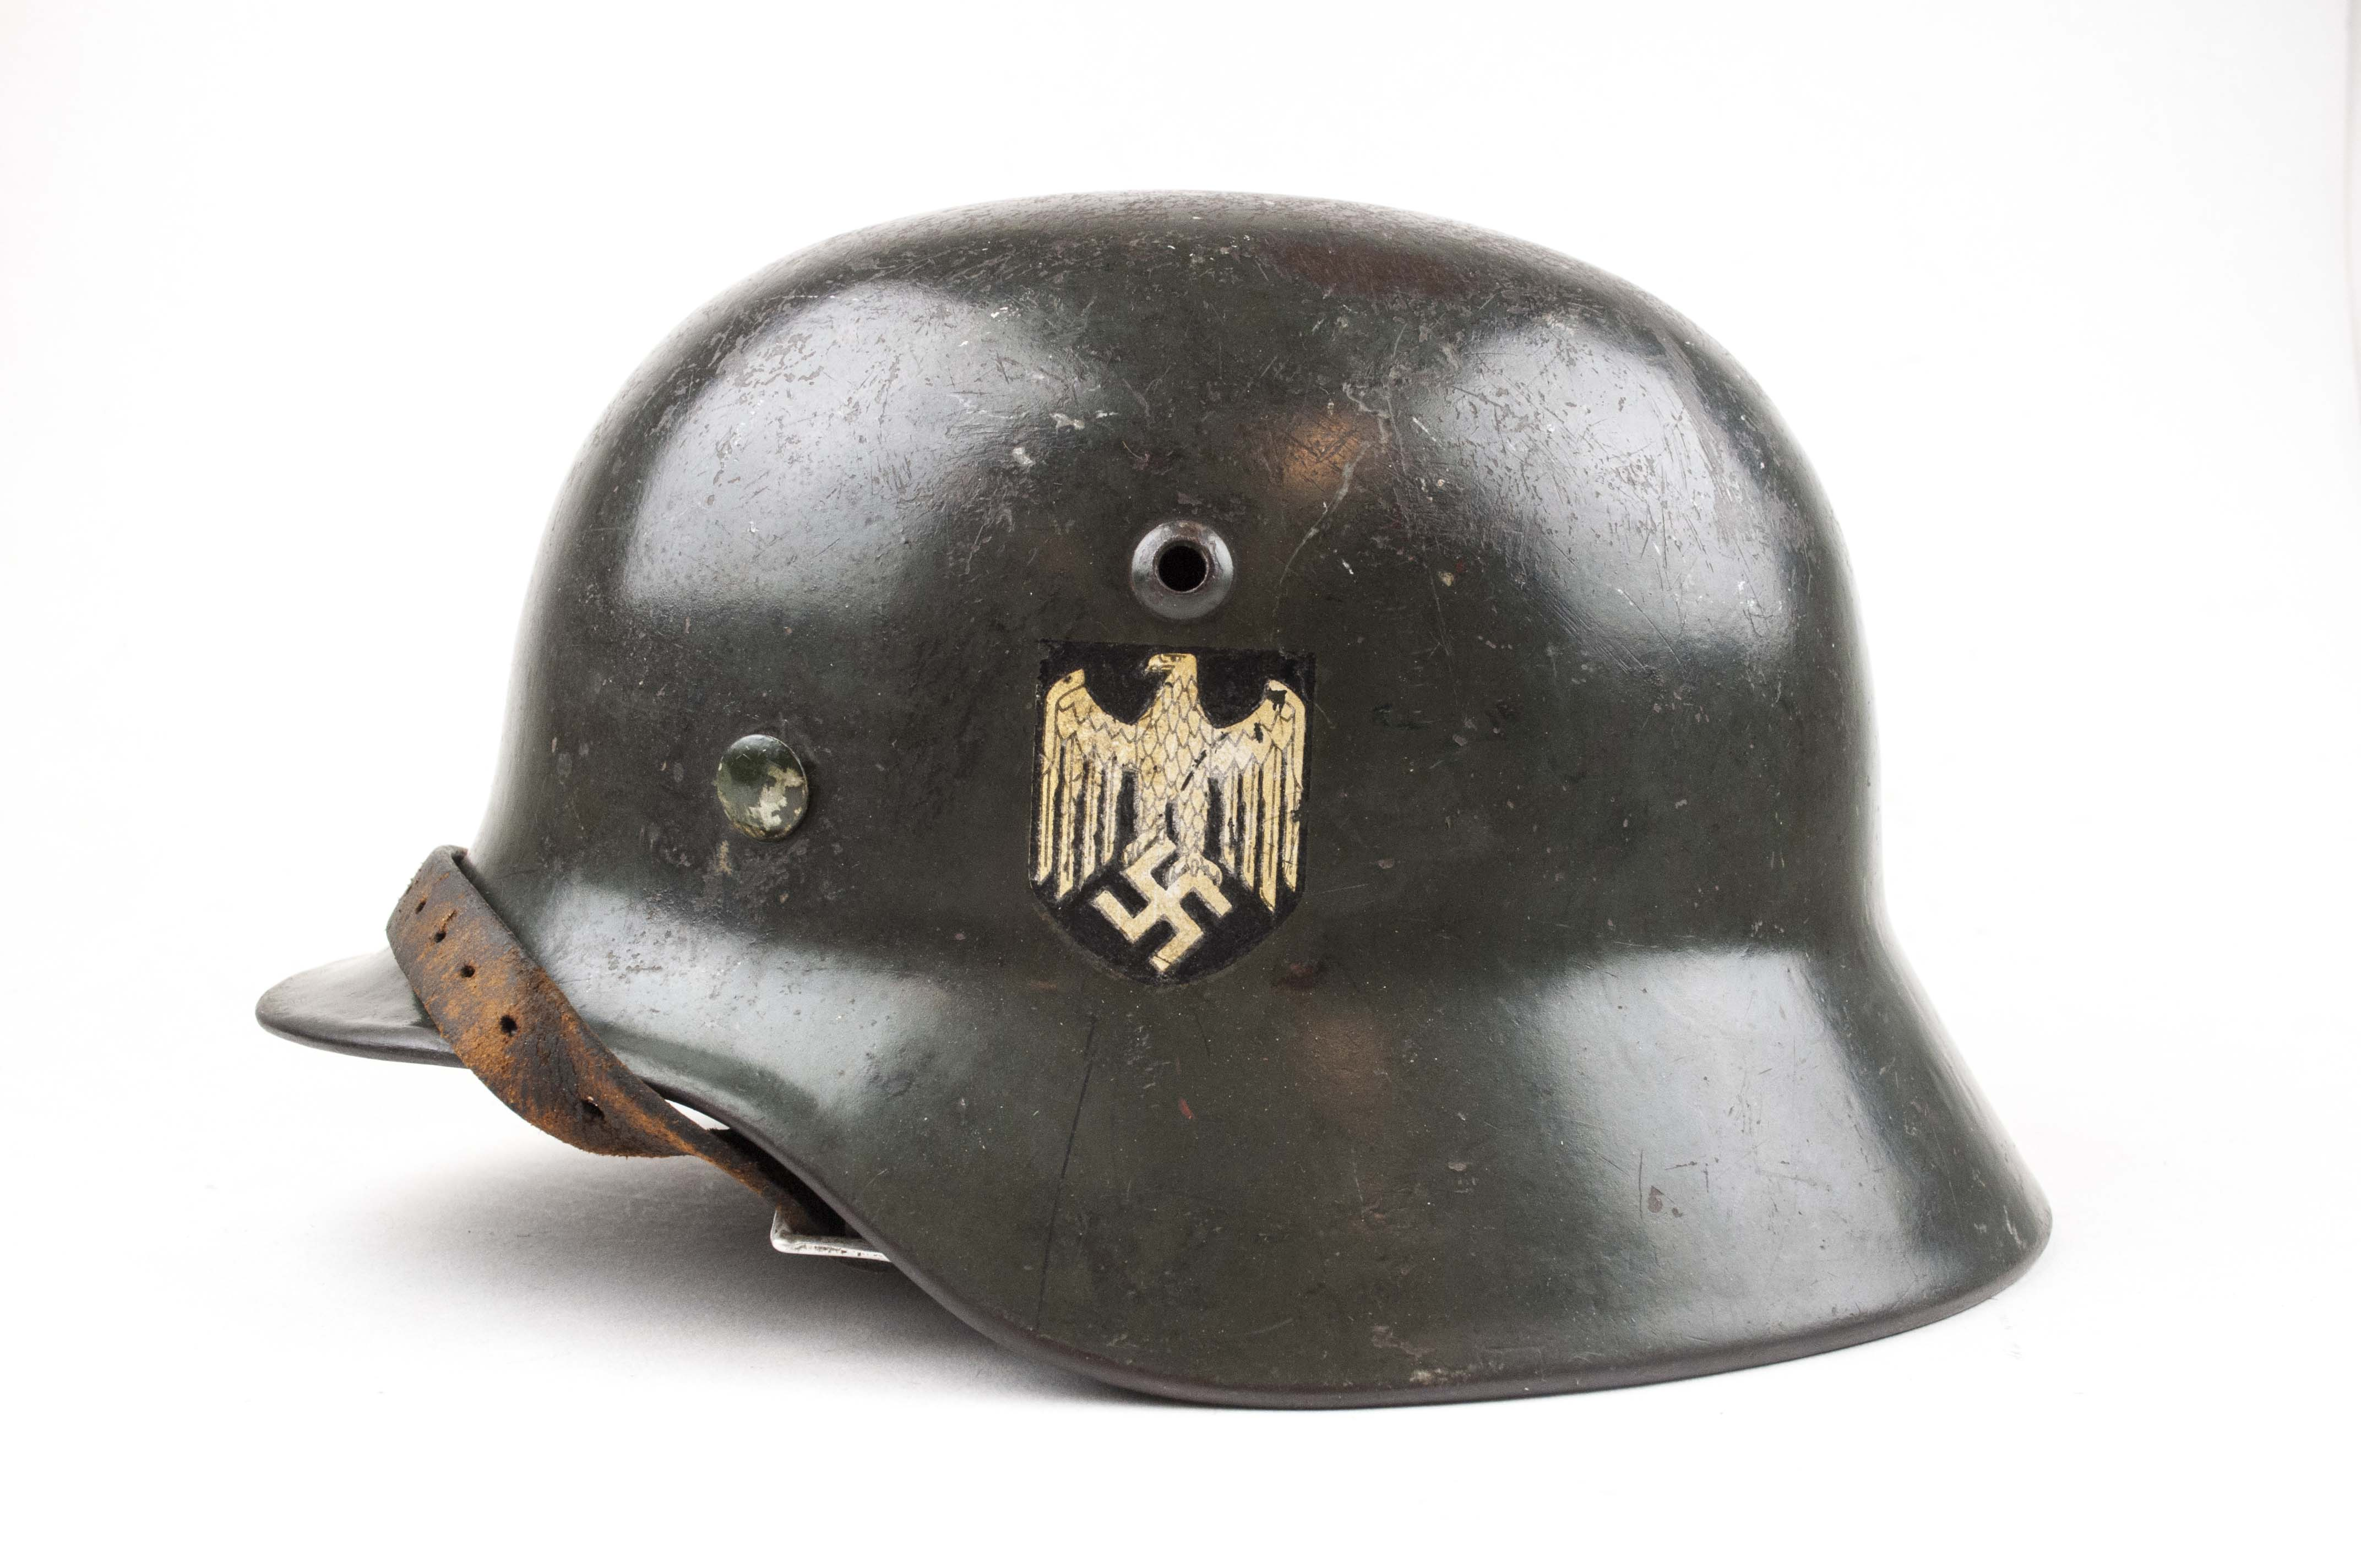 World War 2 German Helmet Insignia